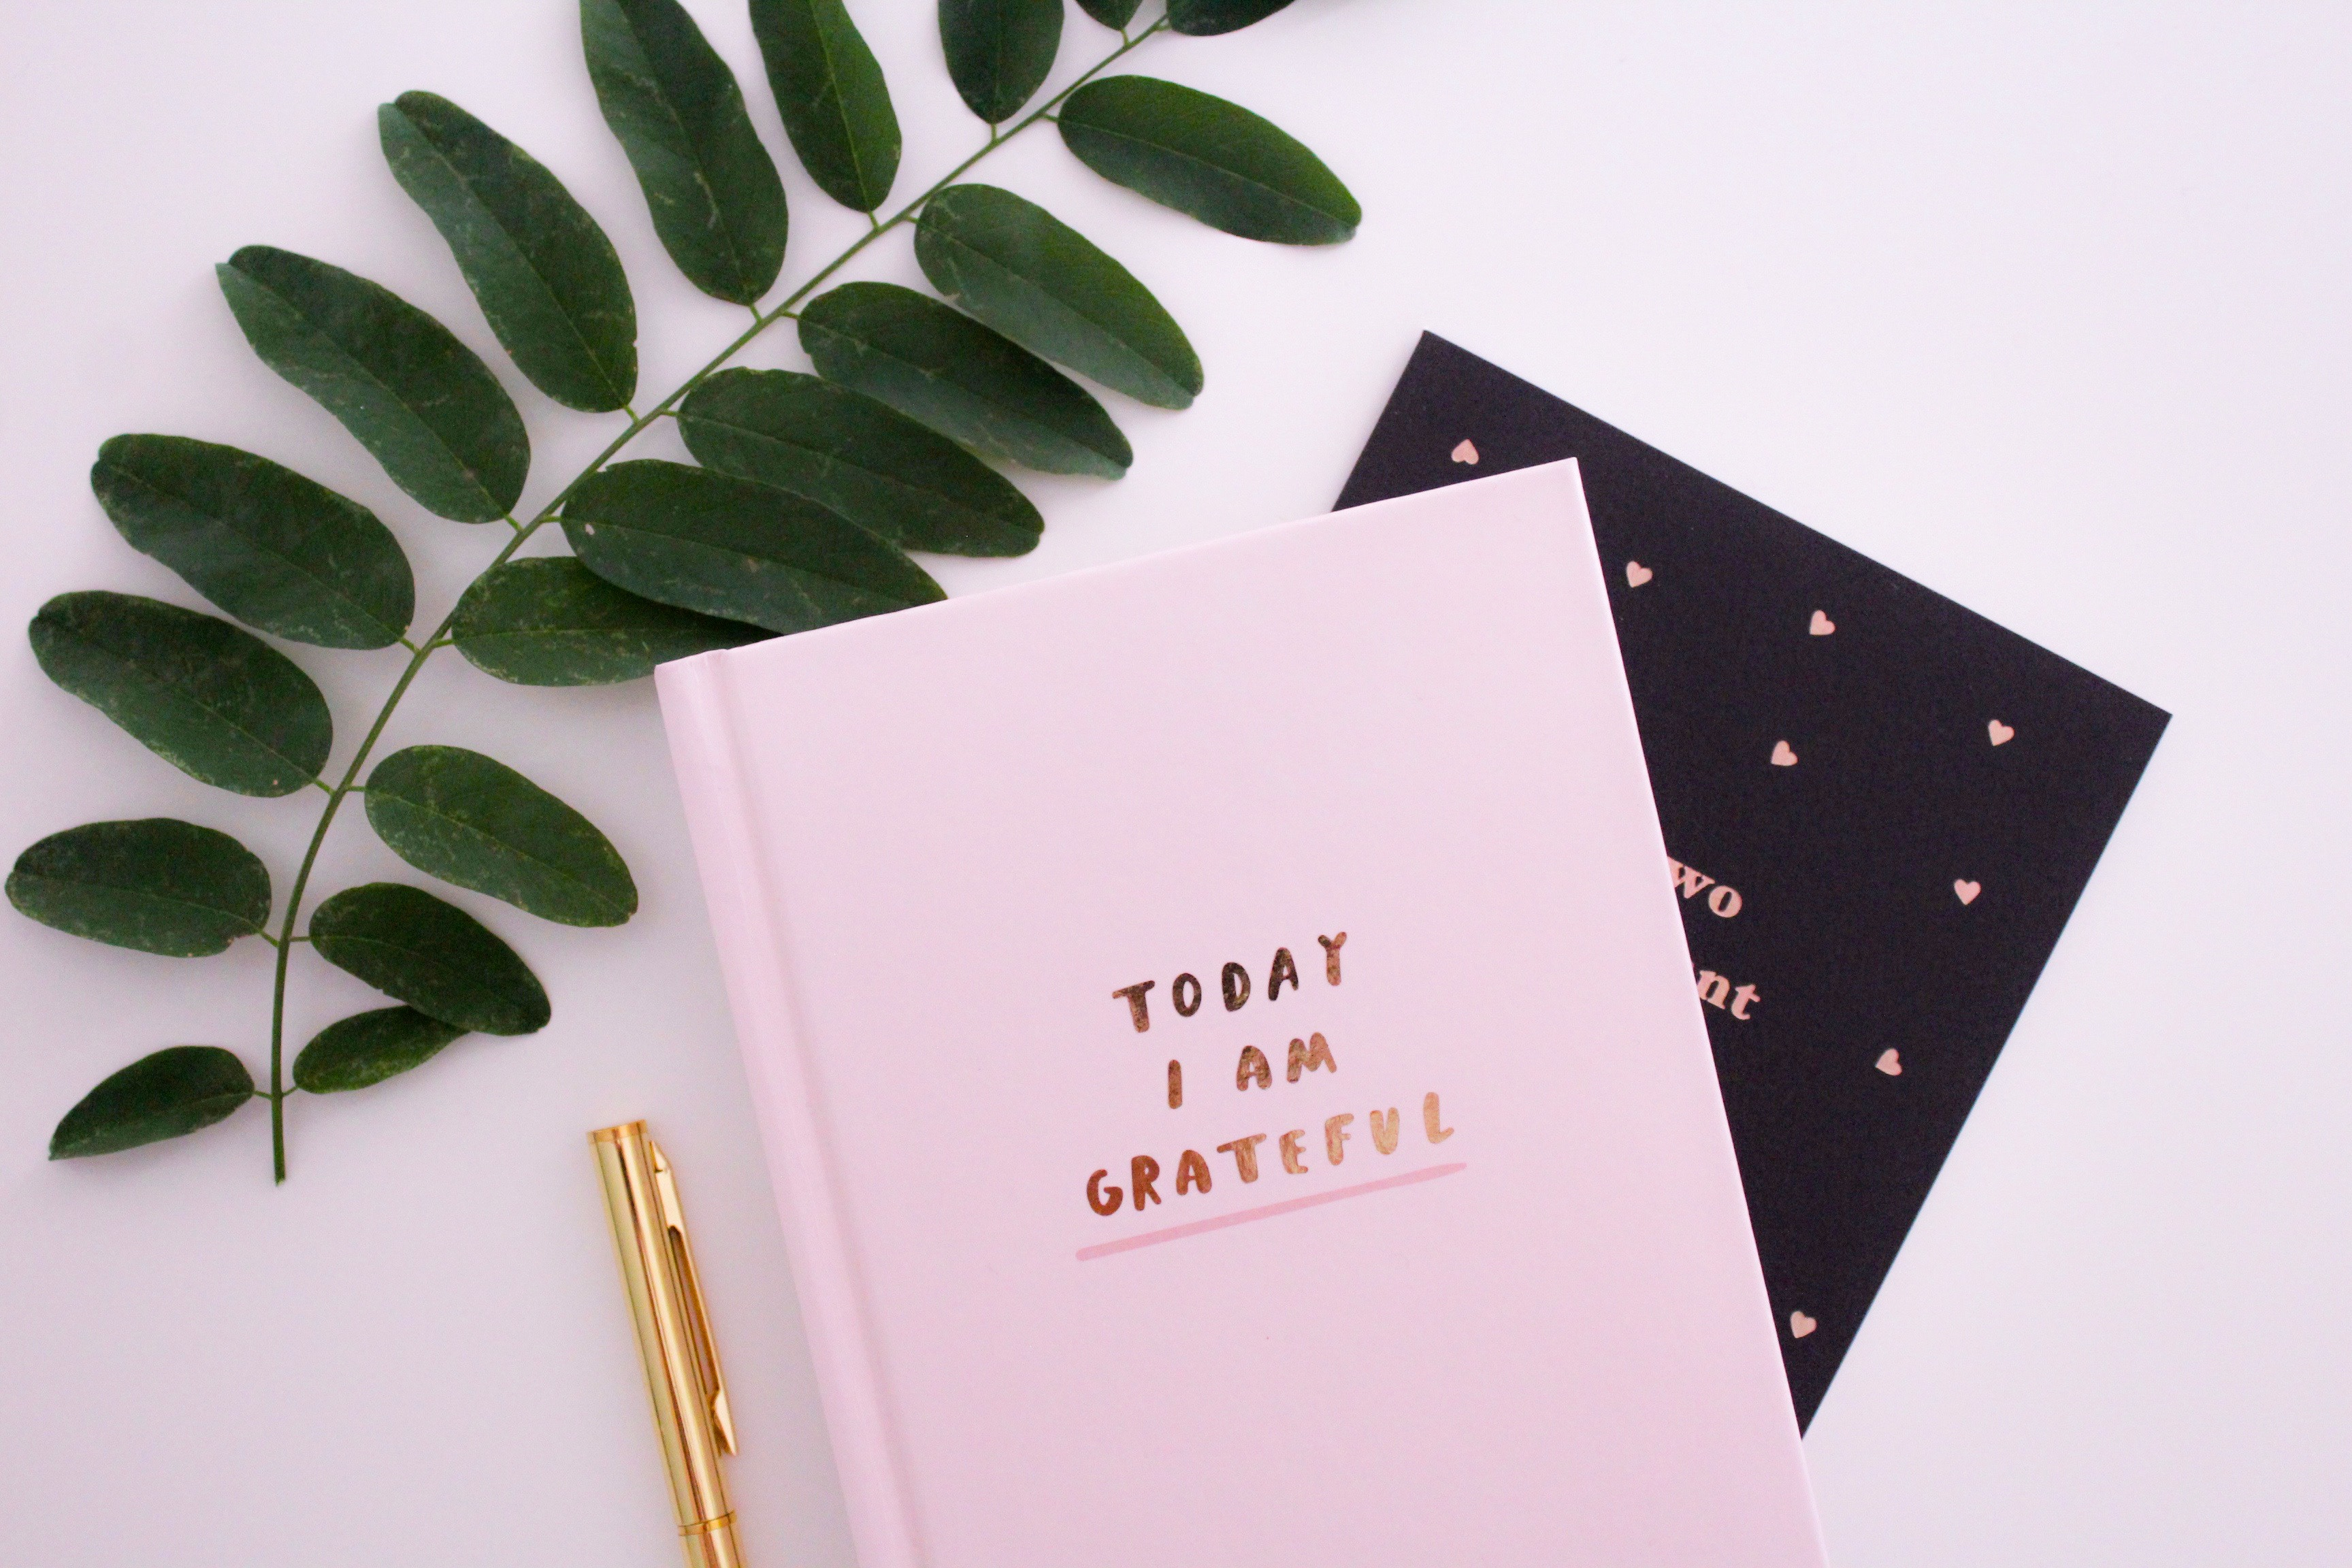 5 Things: Gratitude